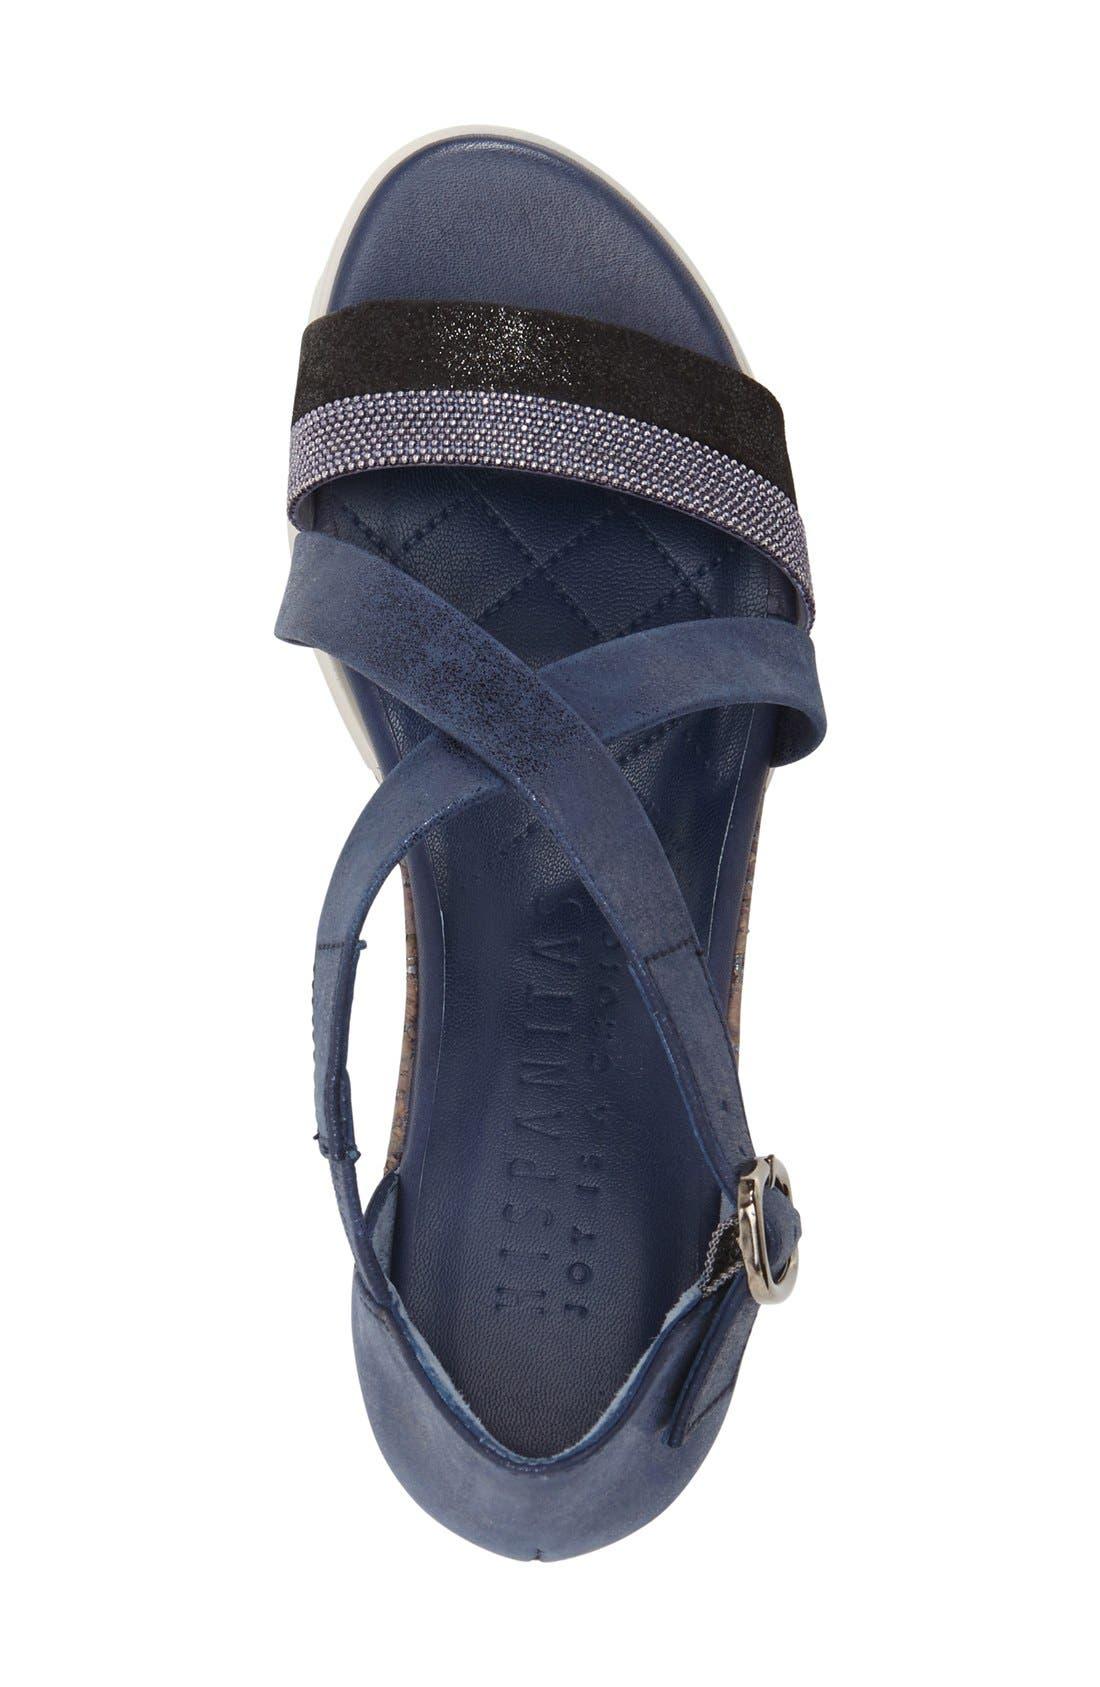 'Kennedi' Wedge Sandal,                             Alternate thumbnail 3, color,                             Jeans Leather